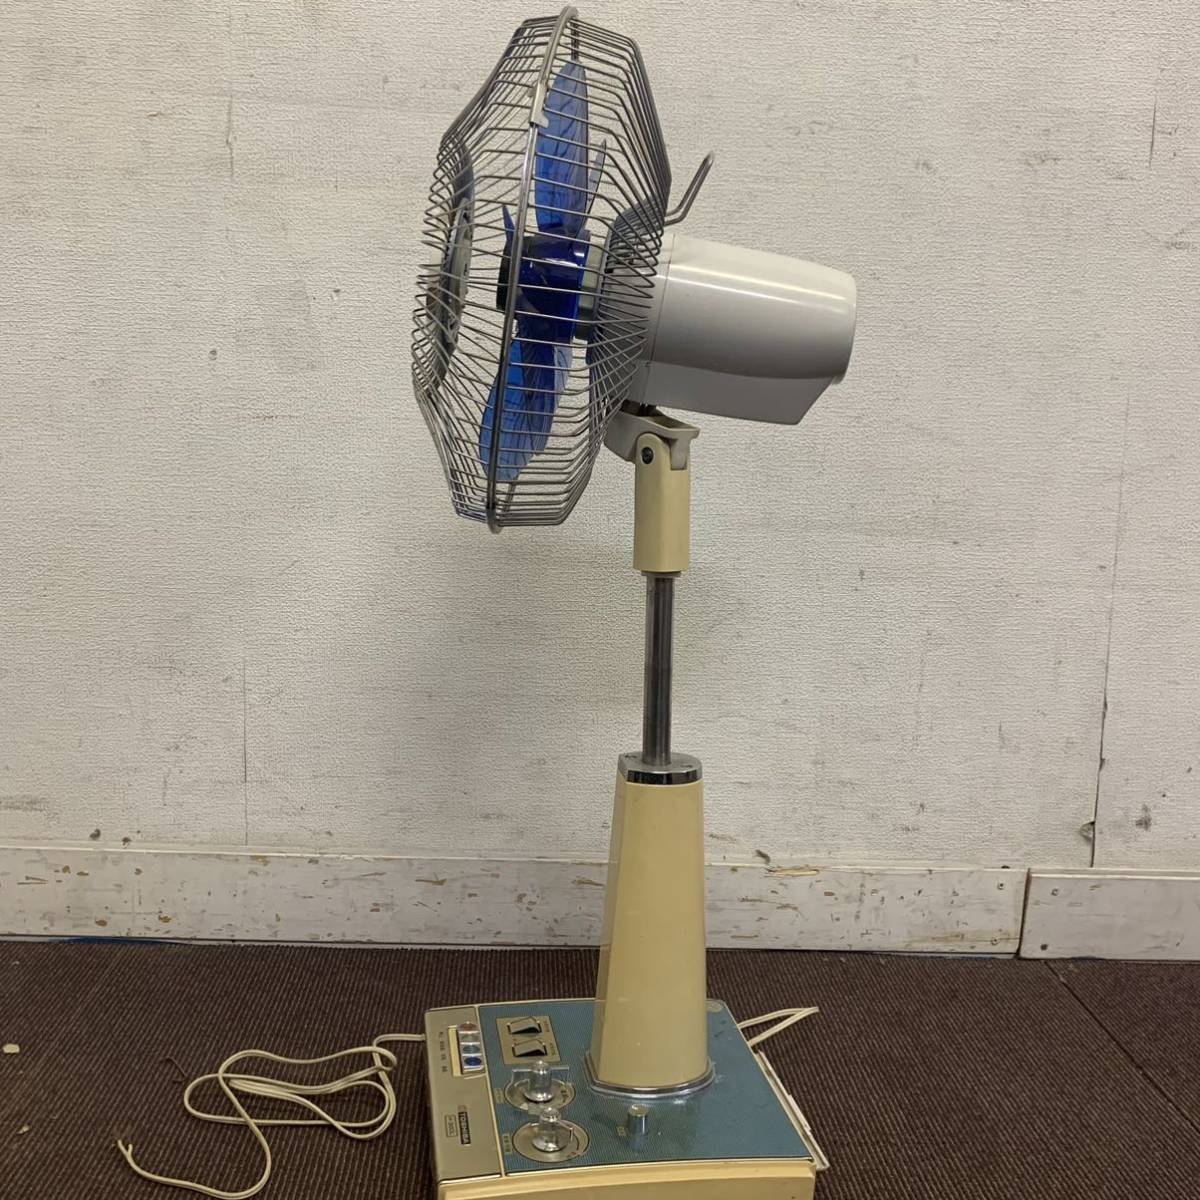 TOSHIBA 扇風機 H-30DL 昭和レトロ 東芝扇風機 レトロ扇風機 アンティーク ジャンク 格安売り切りスタート #_画像2